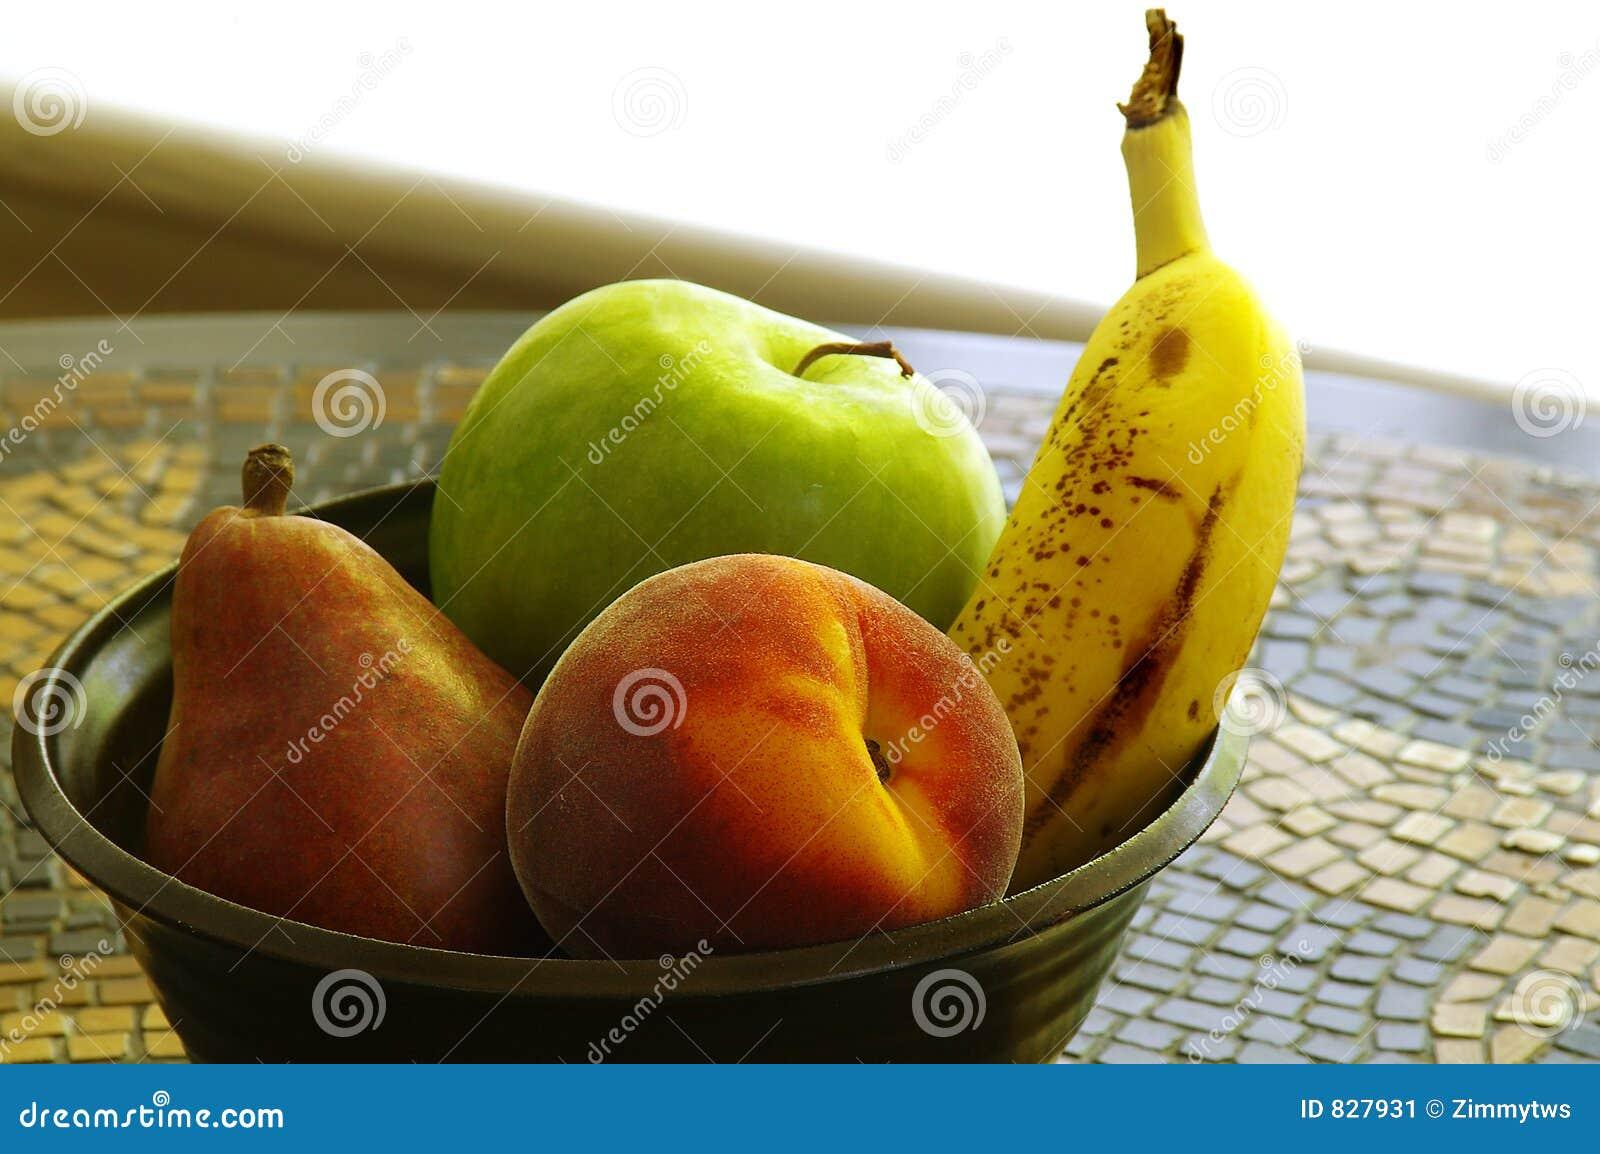 Fruit bowl on tile table